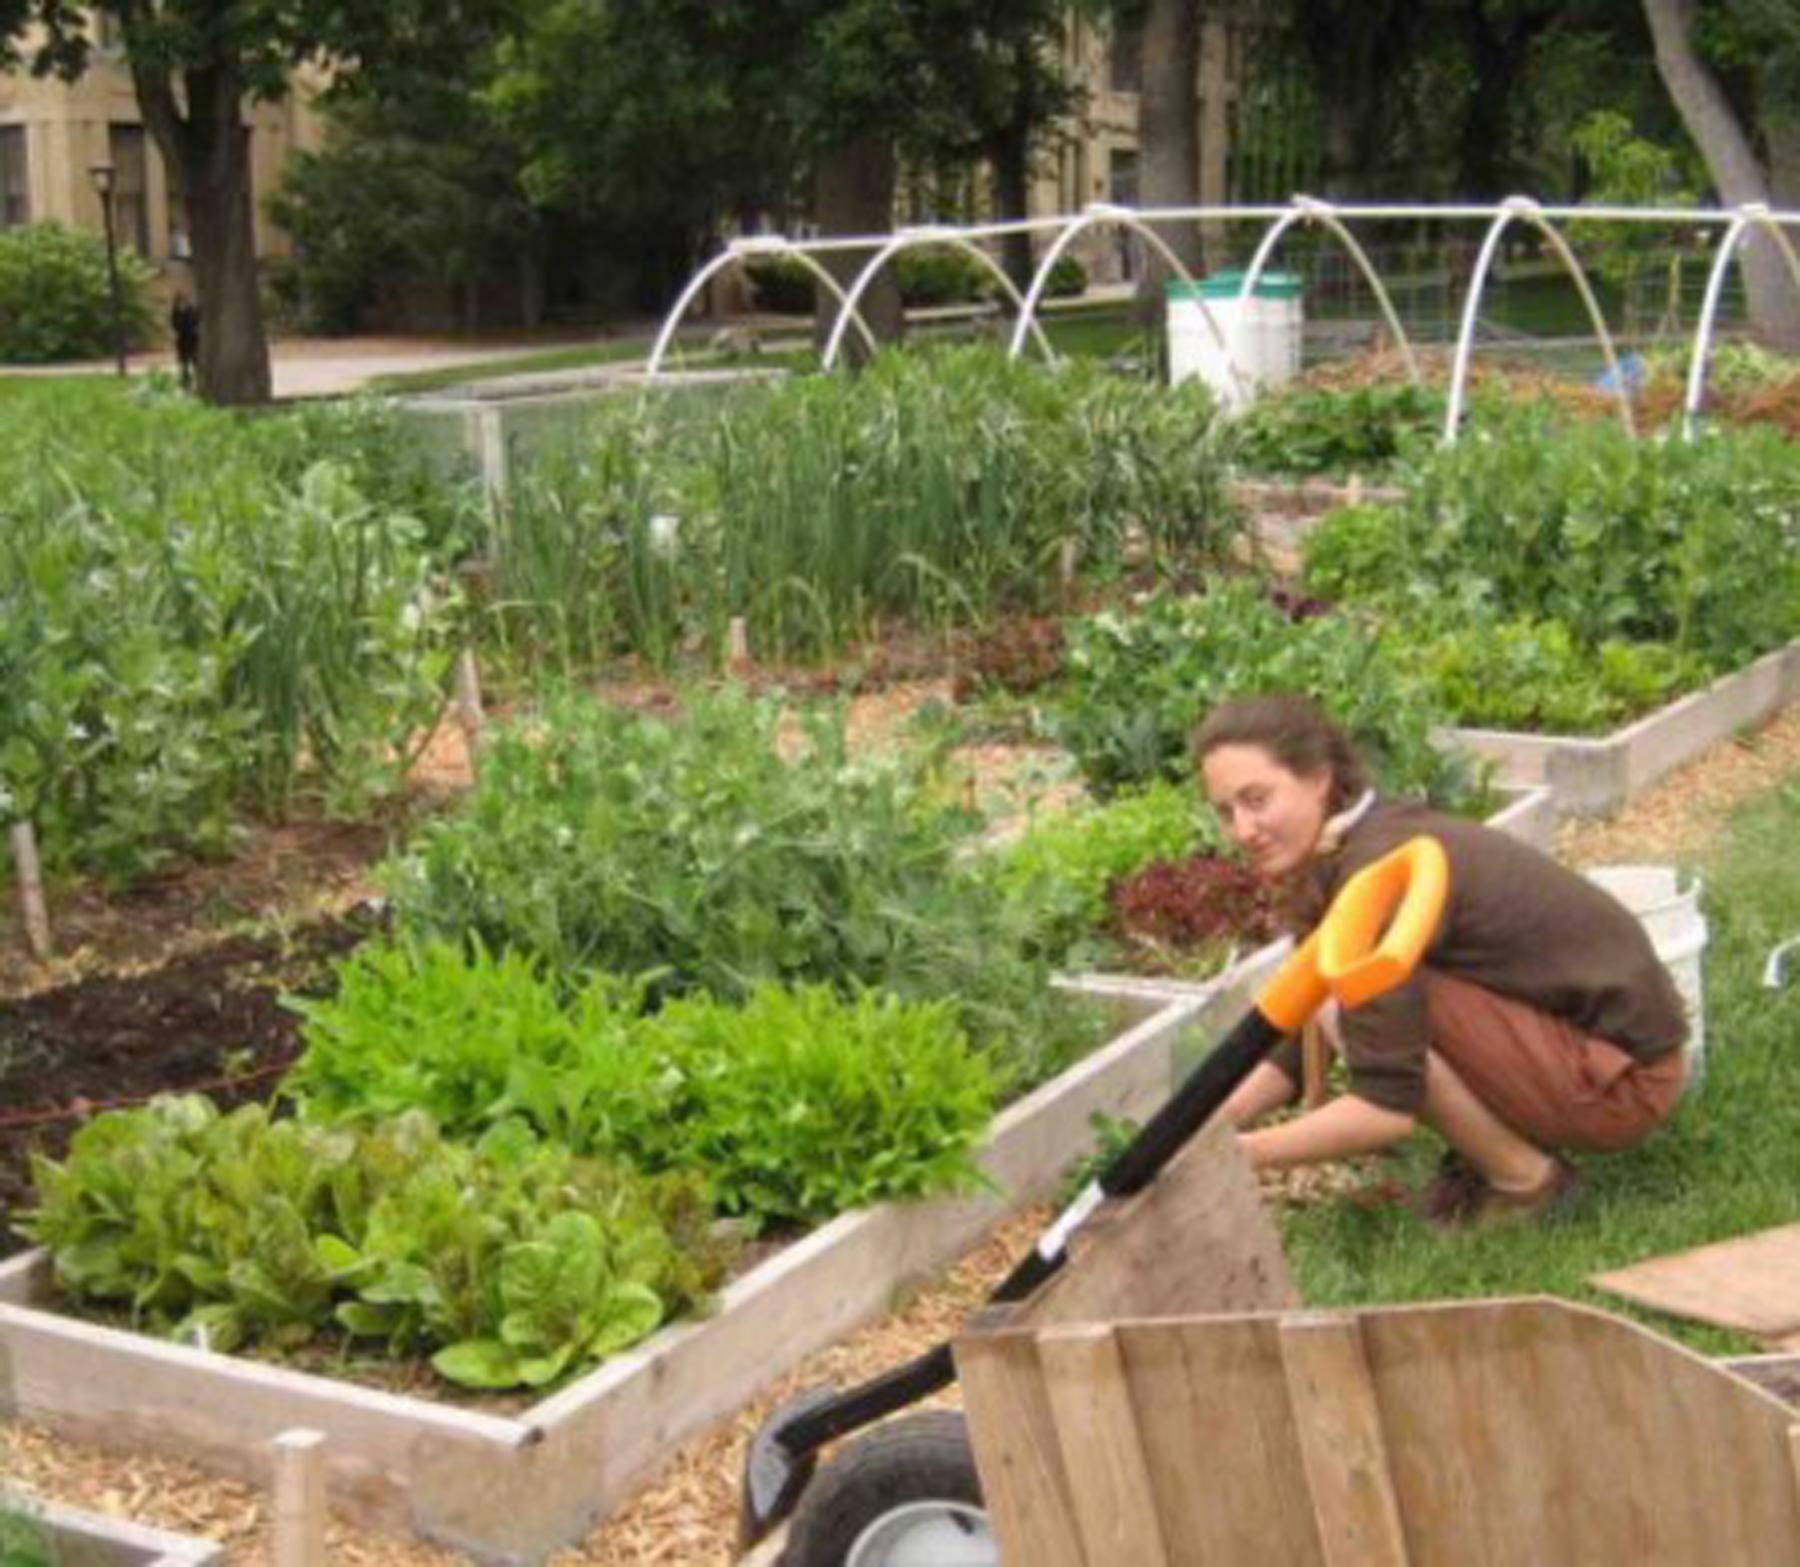 Student Alexandra Parvaz works in Edible Campus Gardens.